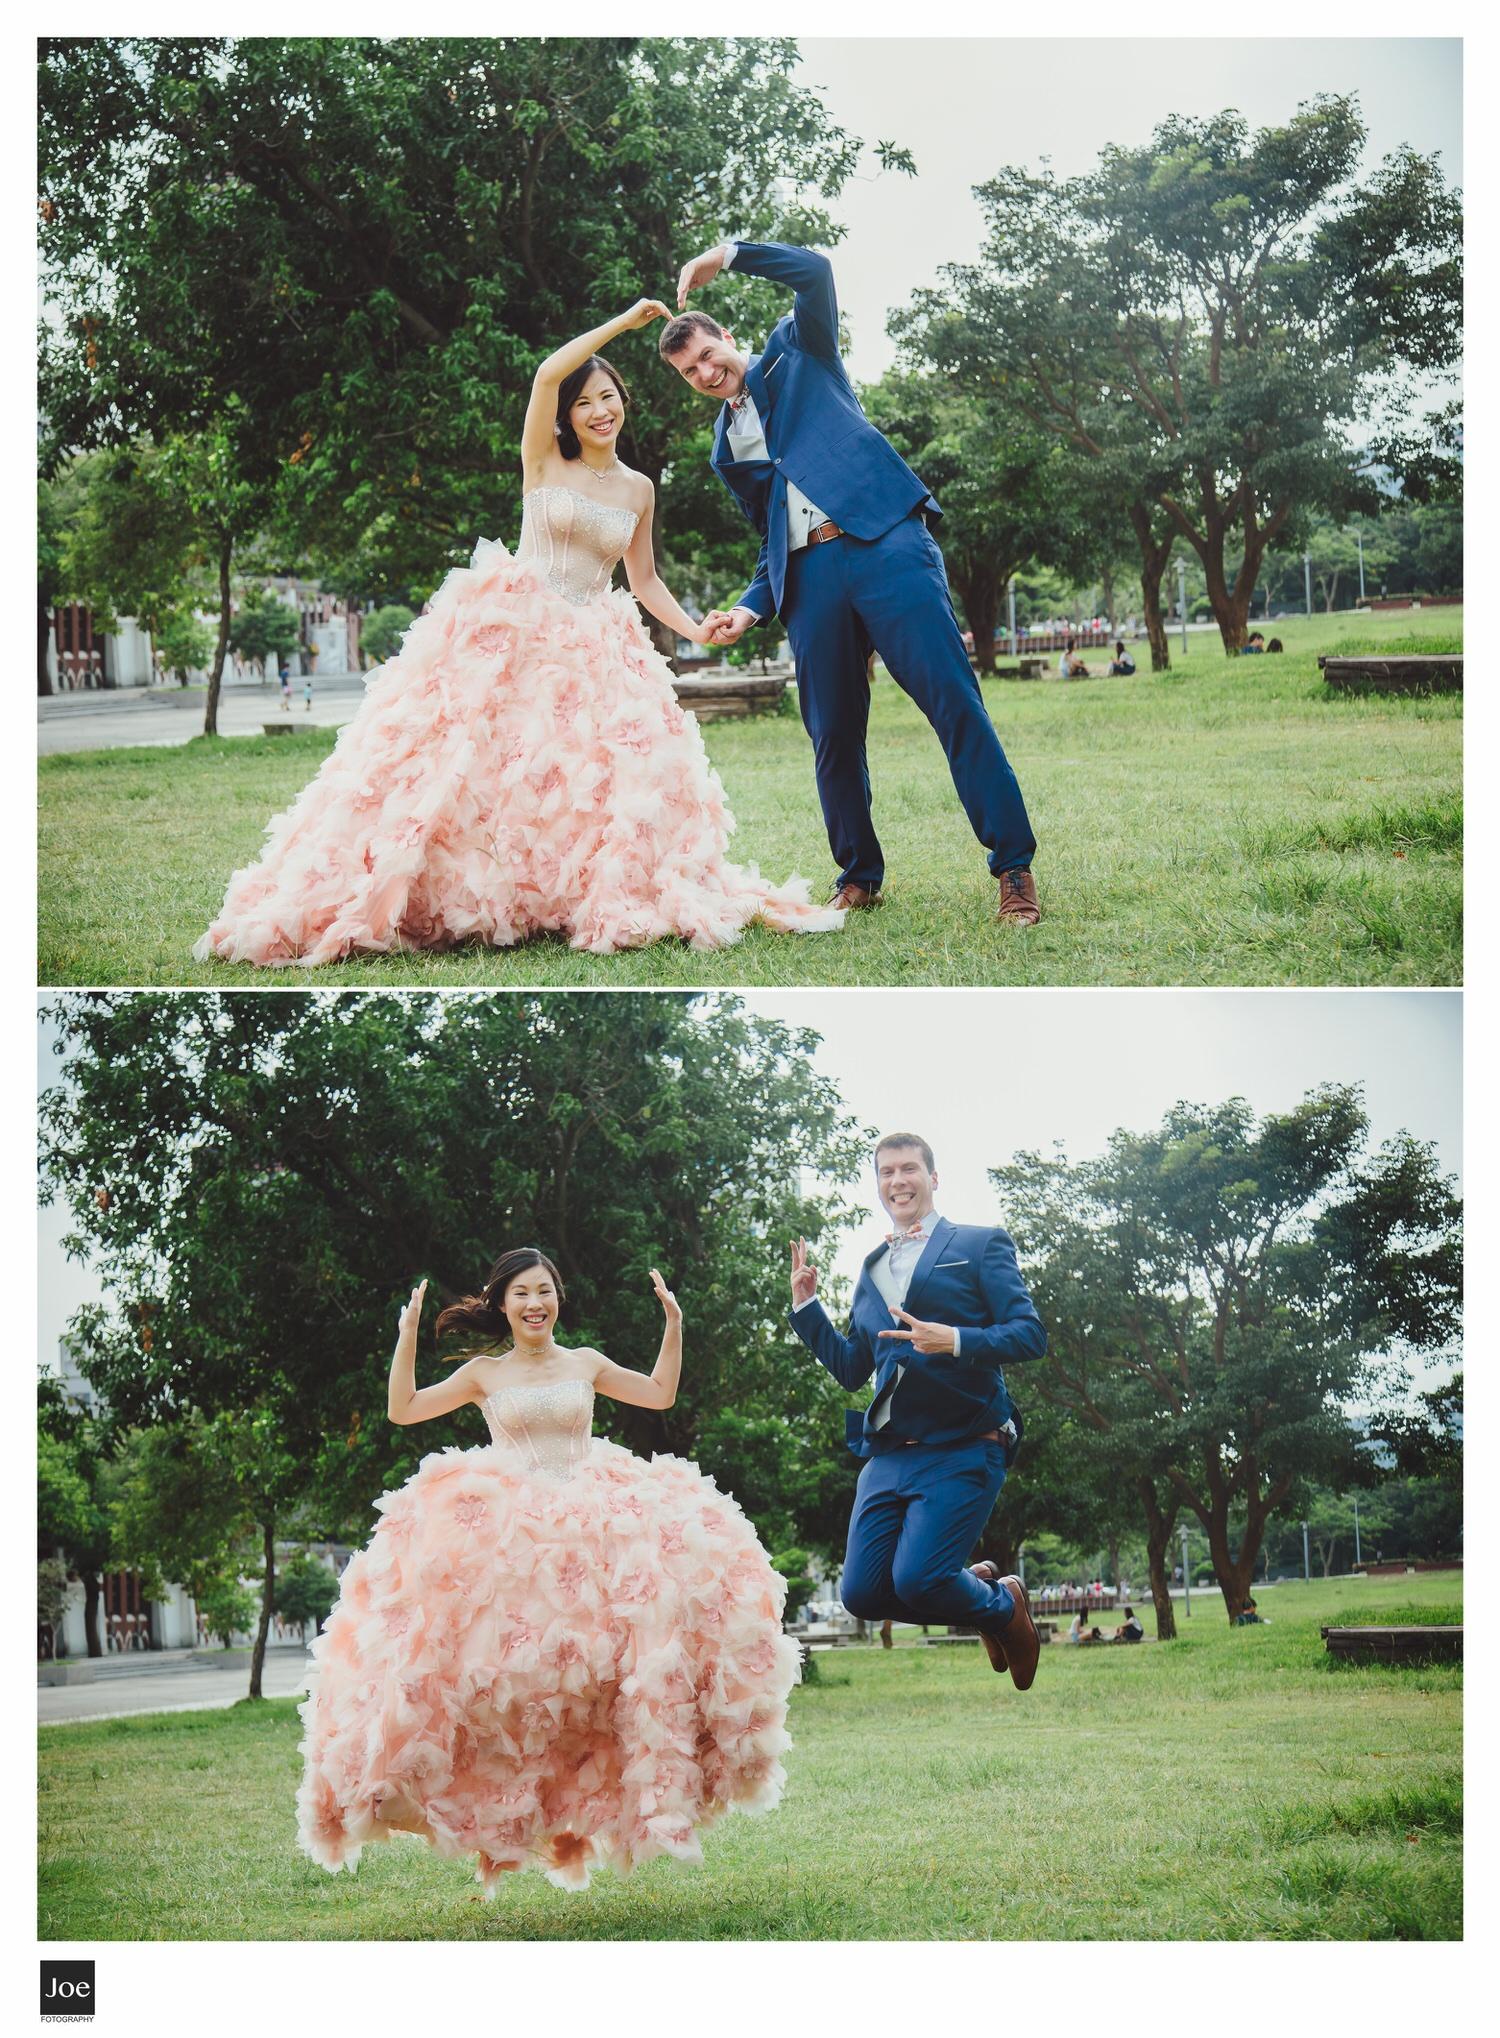 joe-fotography-pre-wedding-kay-jeff-036.jpg